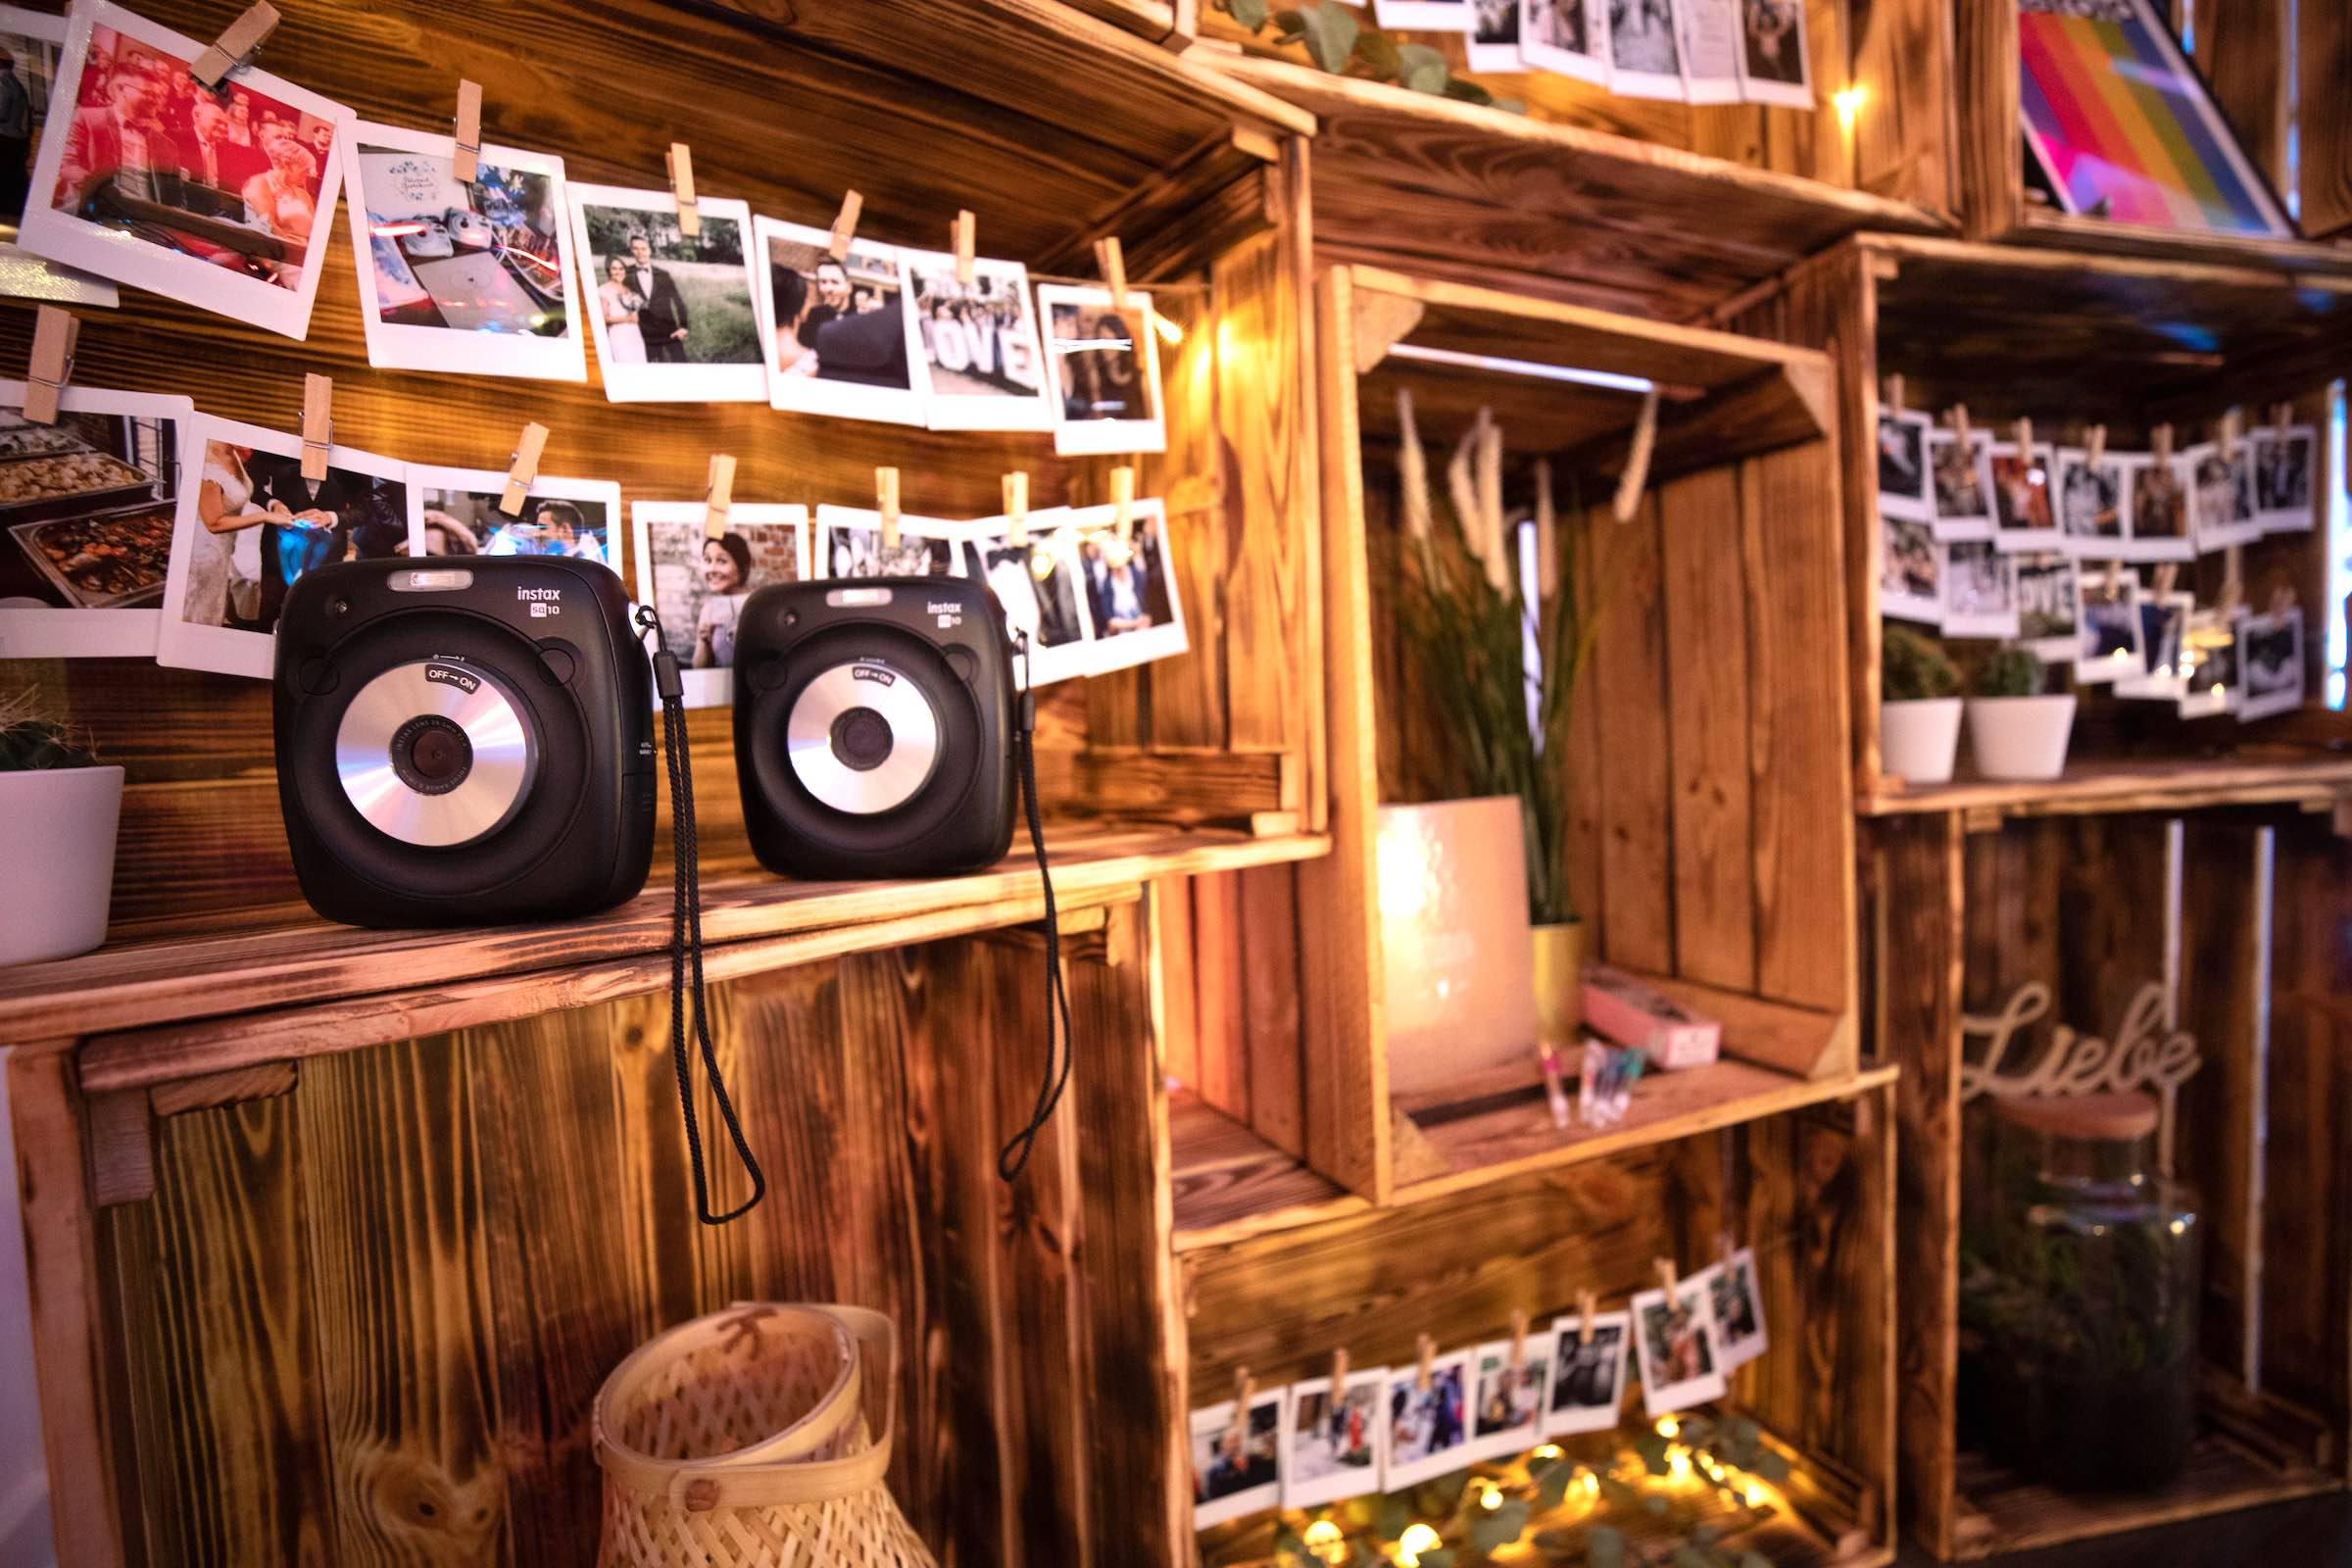 Instax-Kamera-Hochzeit-Mieten-Polaroid-Set-Koffer-Mieten-Anfragen-Polaroid-Hochzeit-Buchen-Hochzeit-Event-Sofortbildkamera-Versand-Lieferung-Knipsel